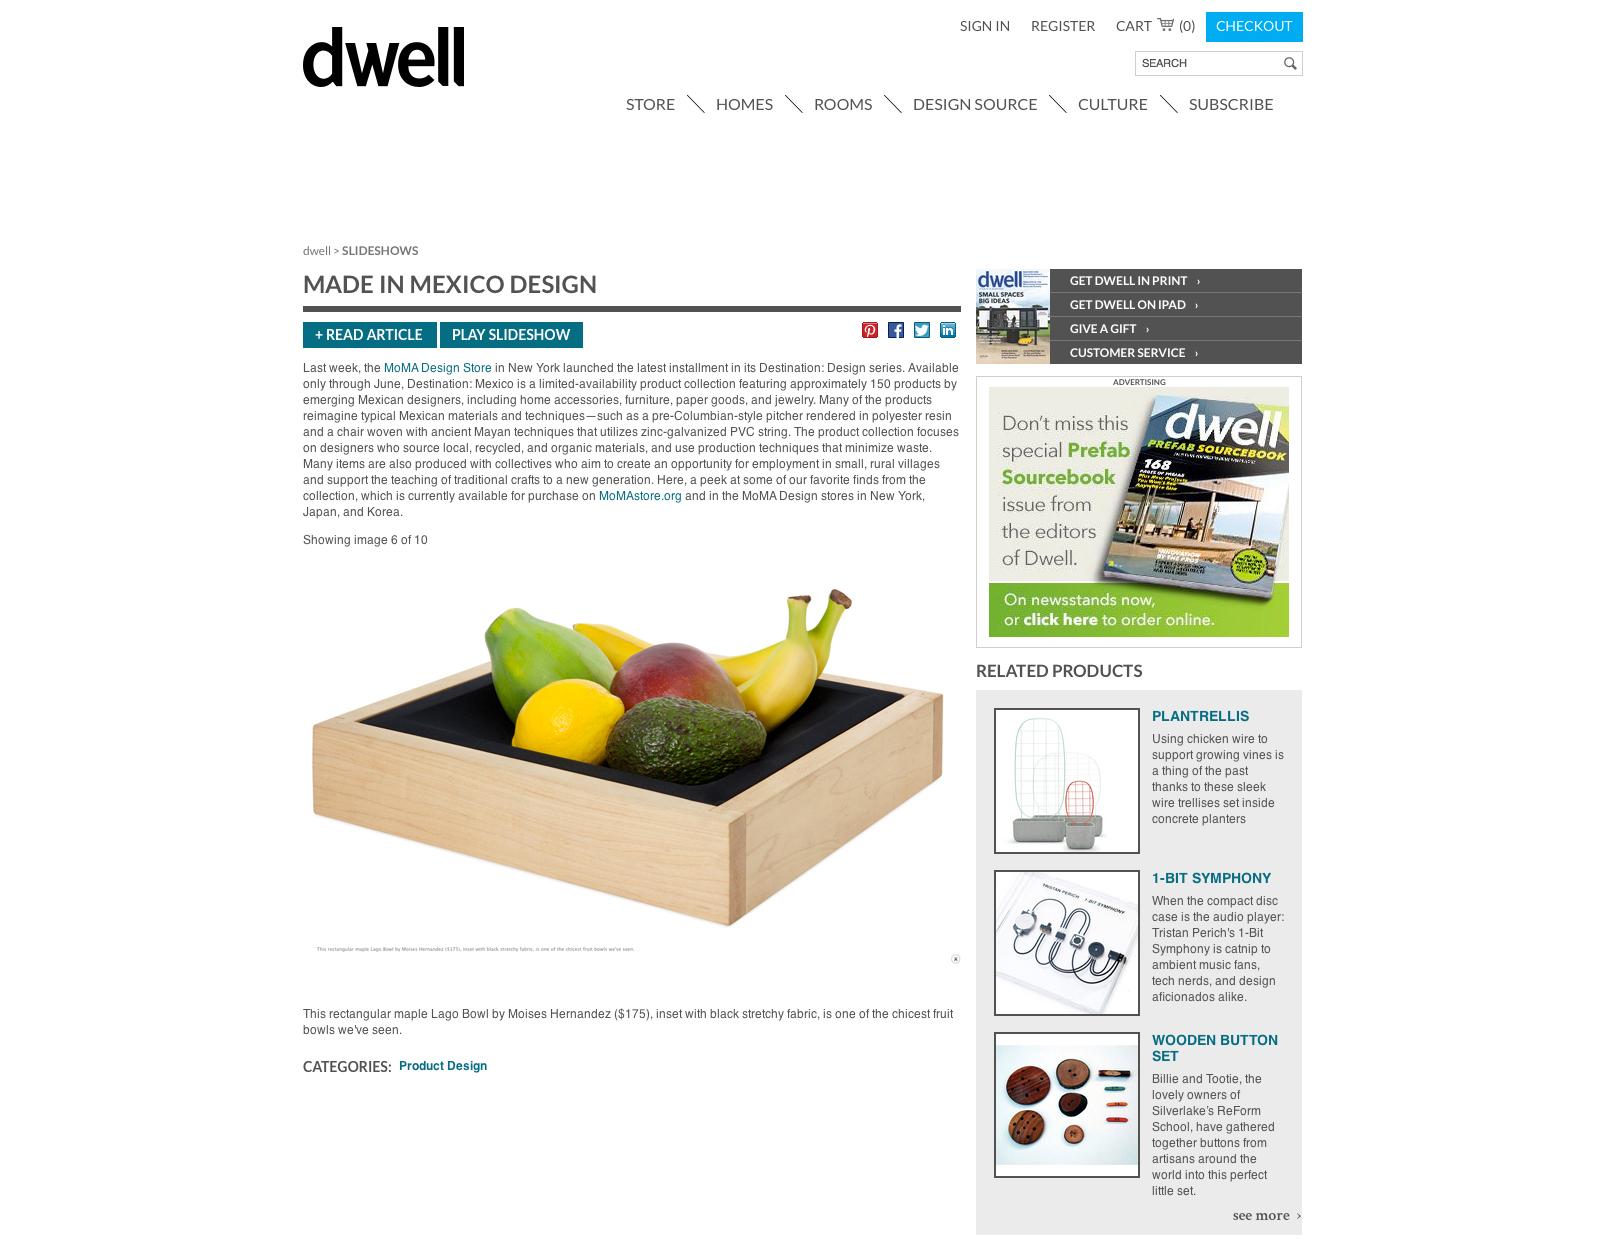 dwell-l.jpg